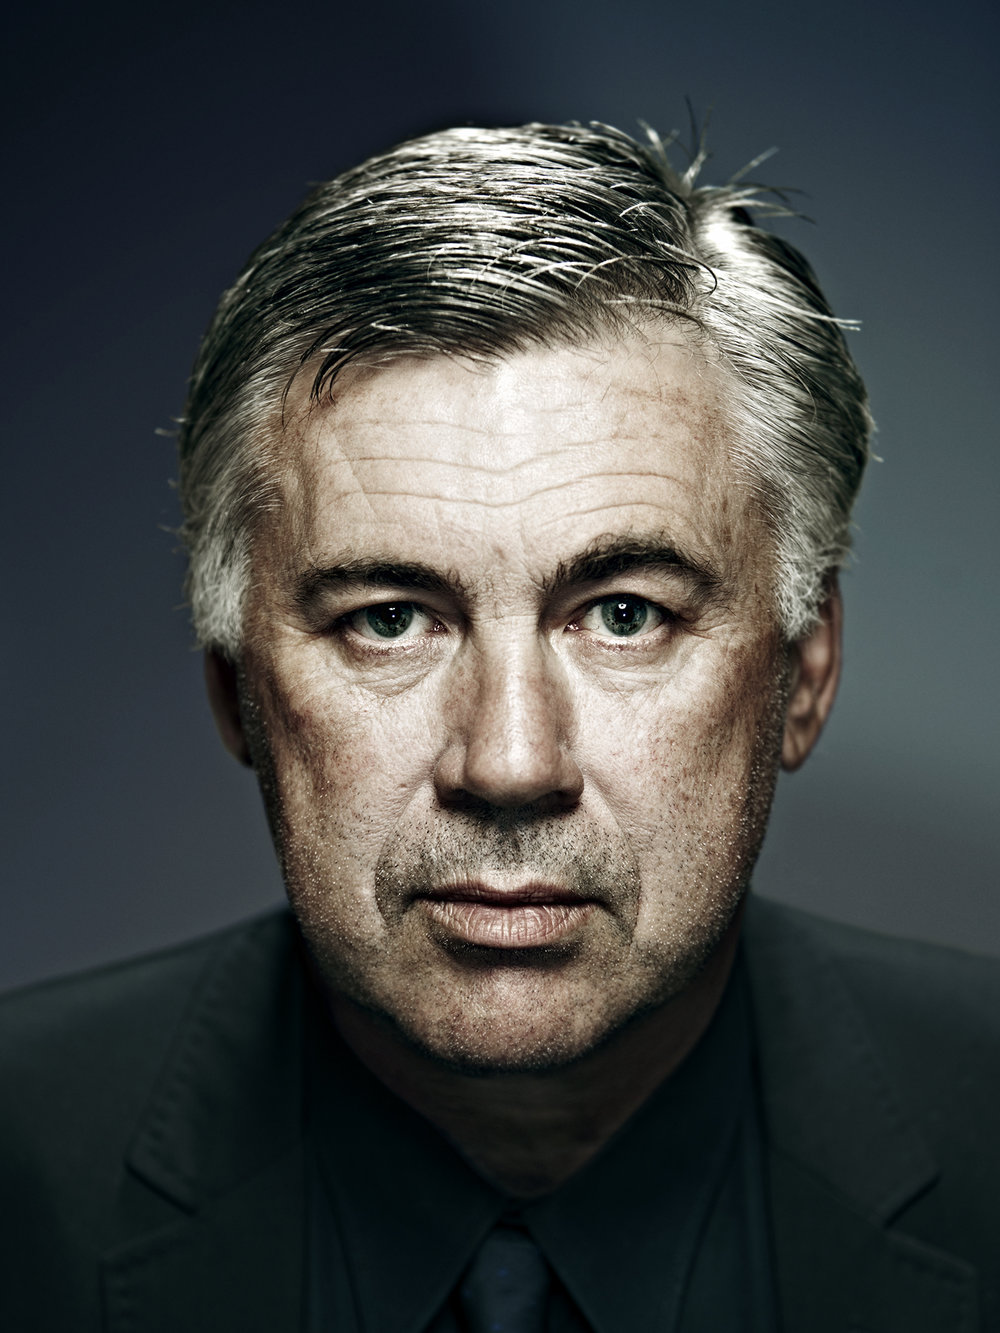 Carlos Ancelotti, football manager